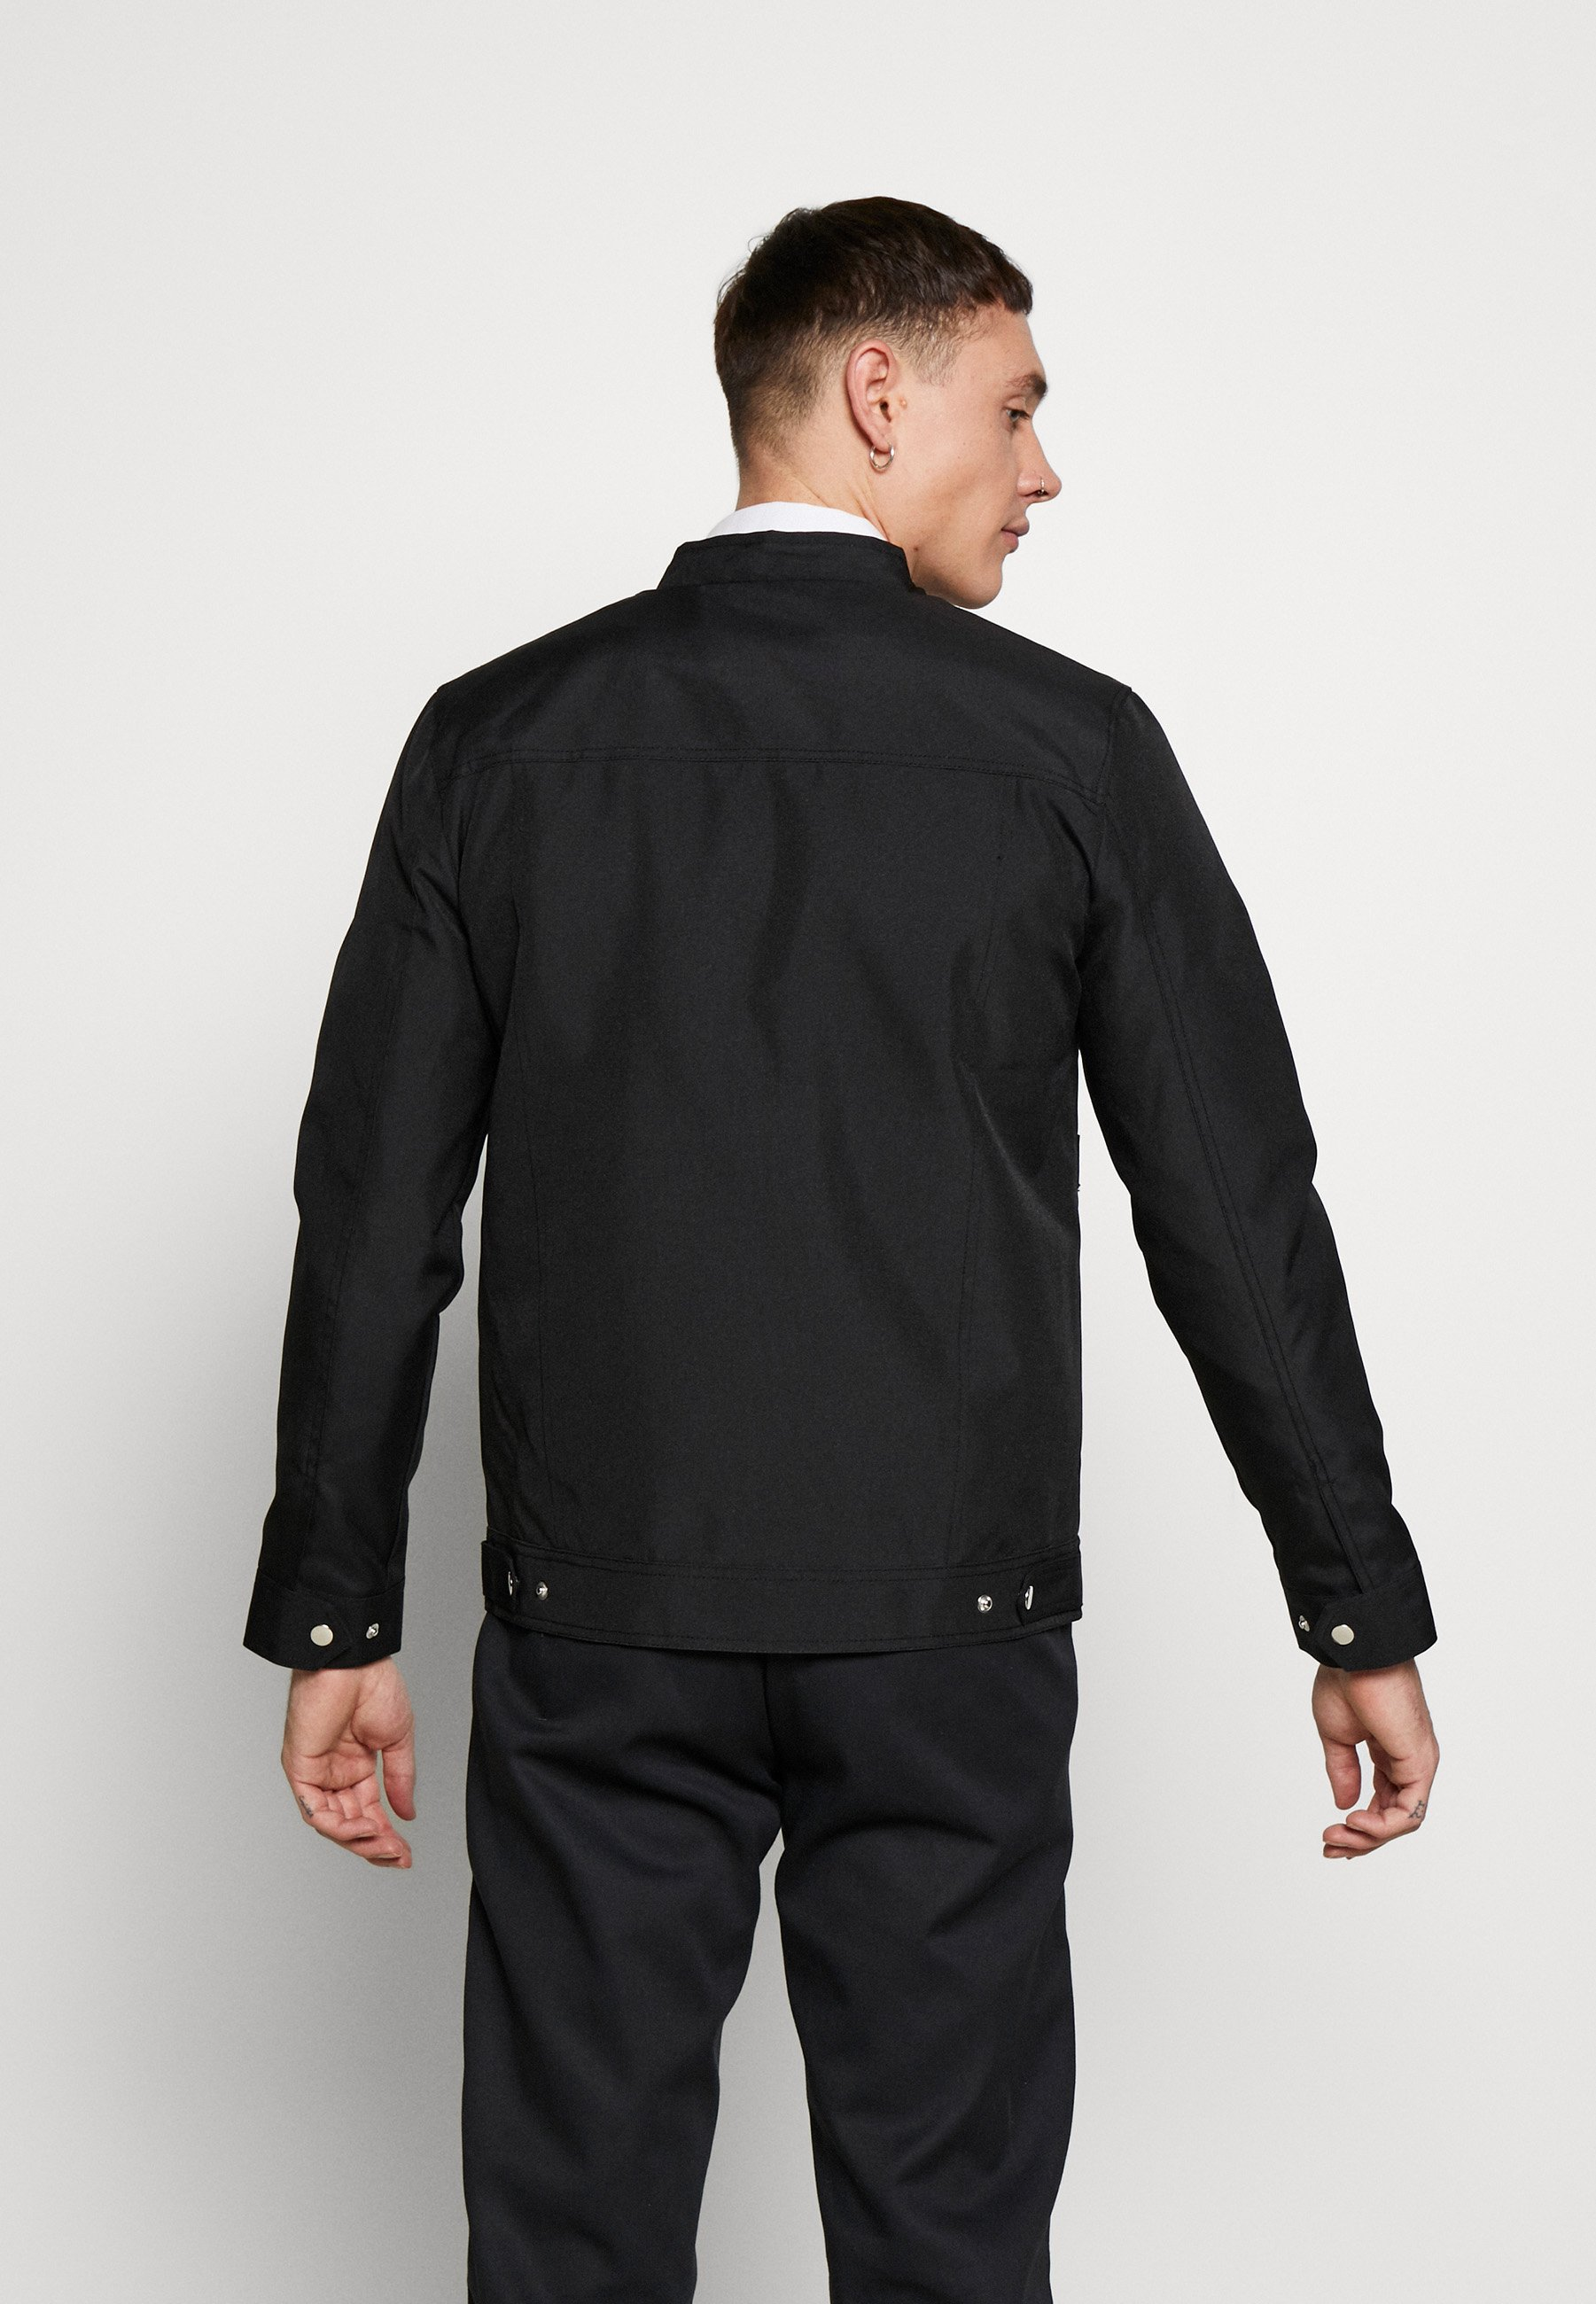 Online Miesten vaatteet Sarja dfKJIUp97454sfGHYHD Burton Menswear London RACER JACKET Kevyt takki black